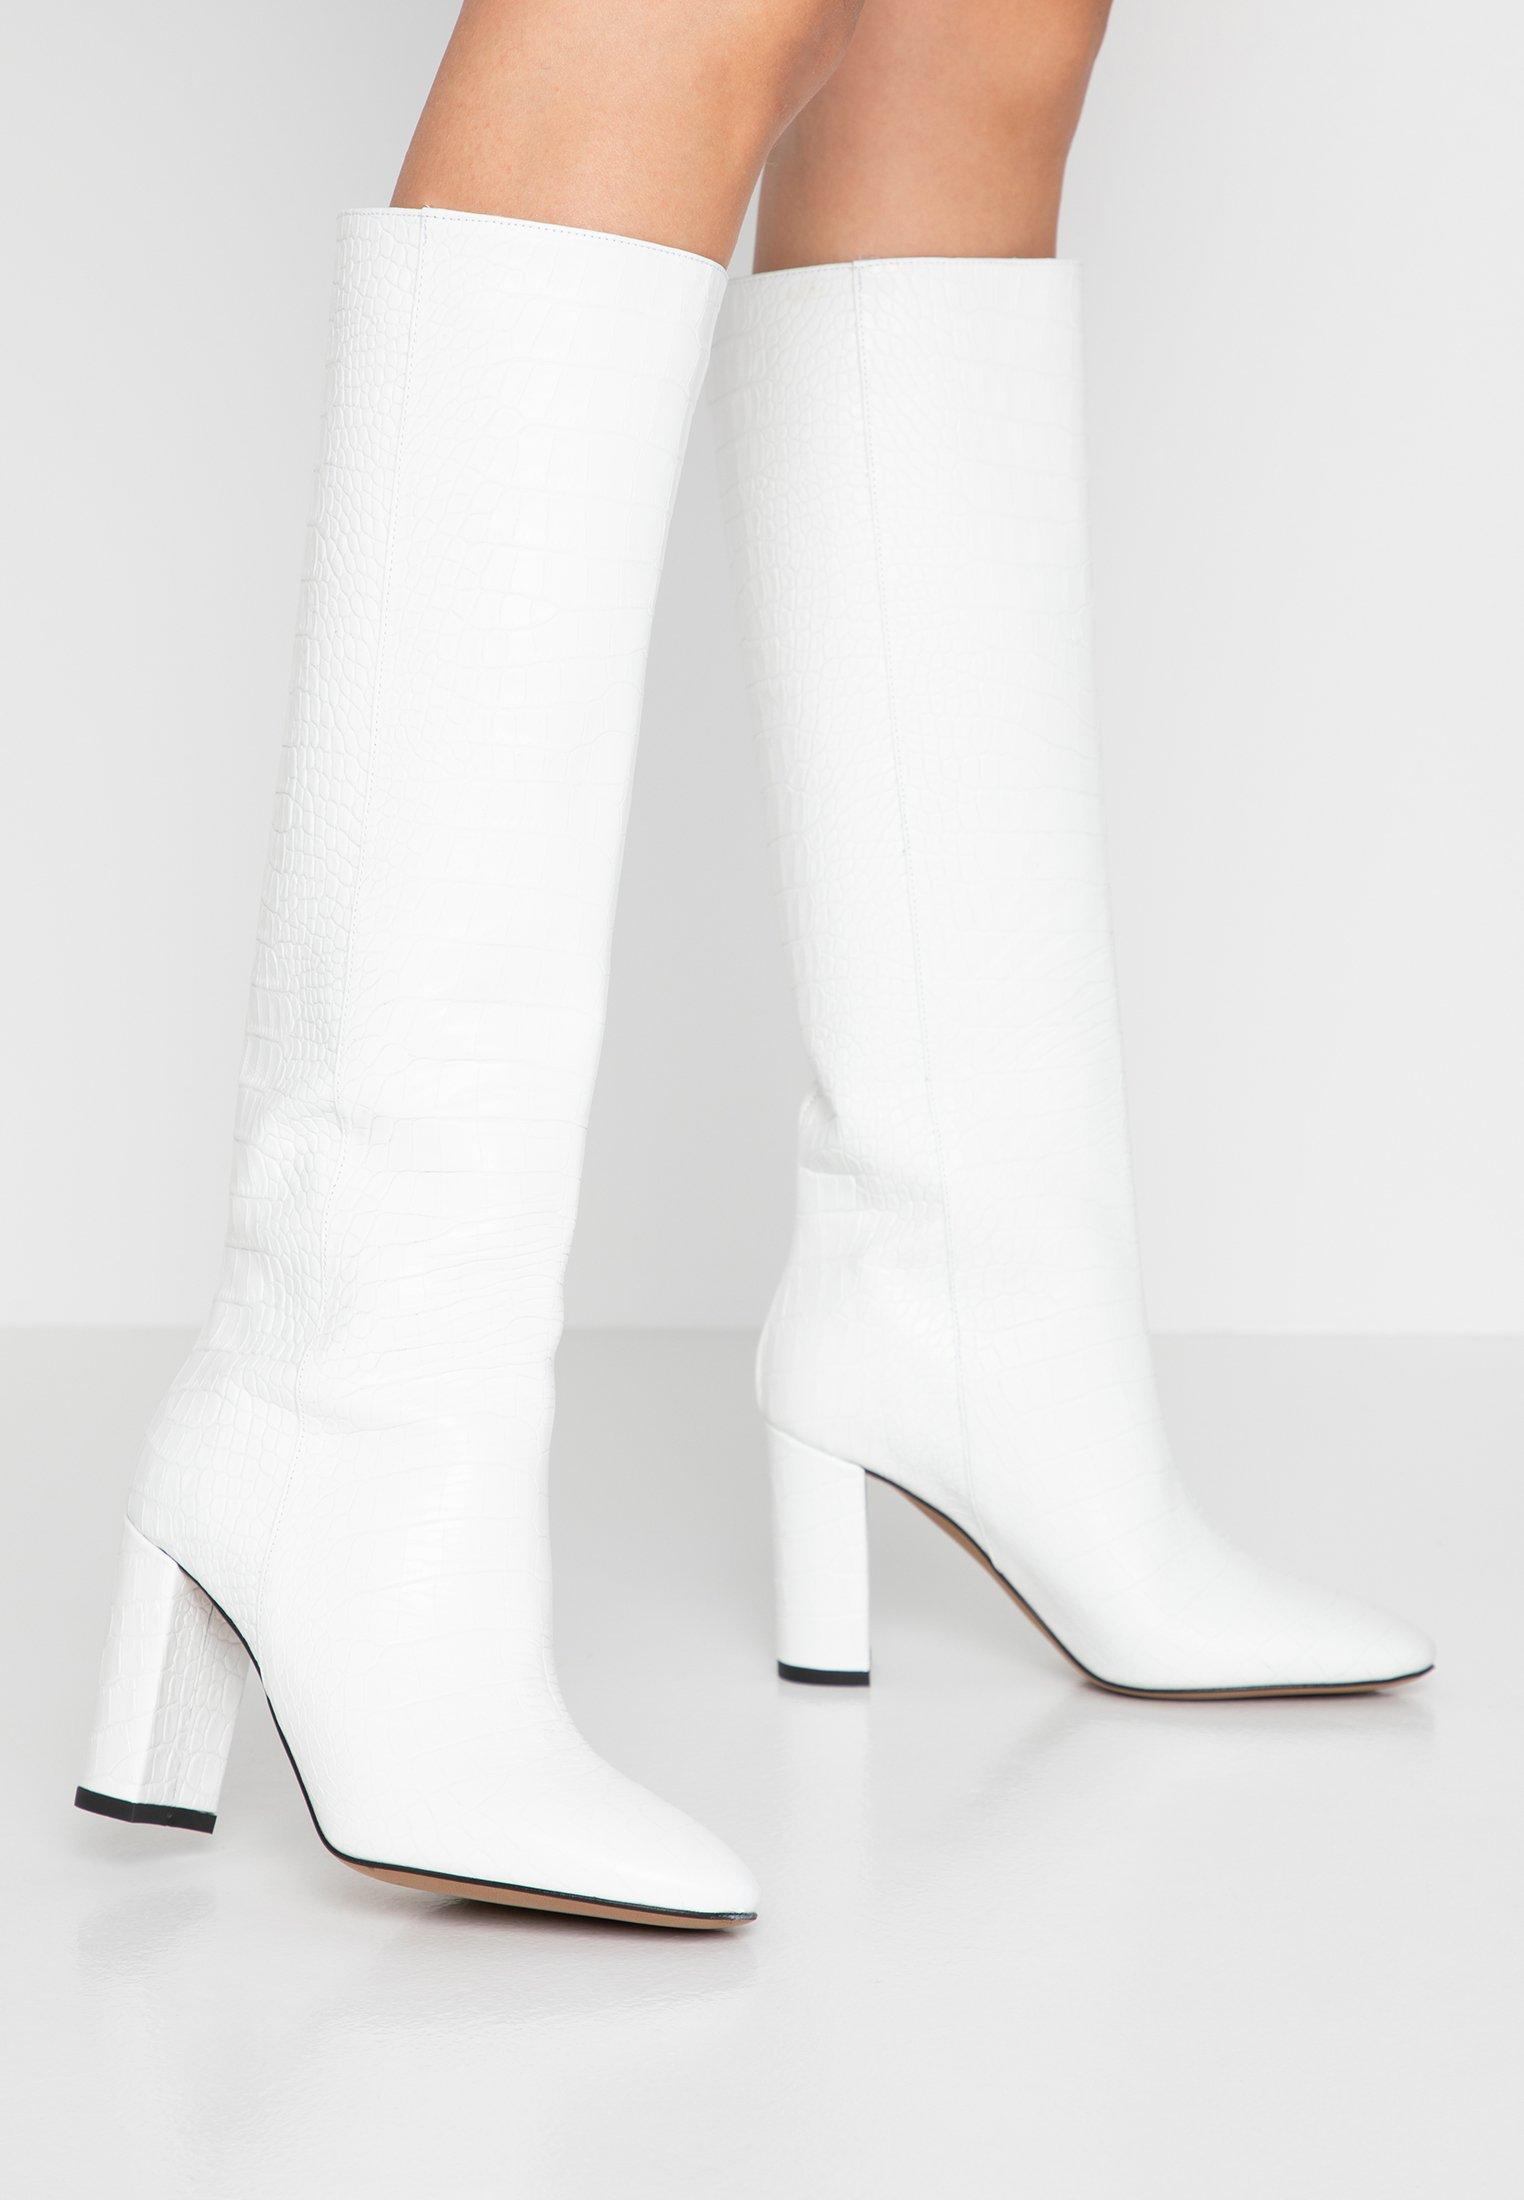 Bianca Di - High Heel Stiefel - cocco bianco